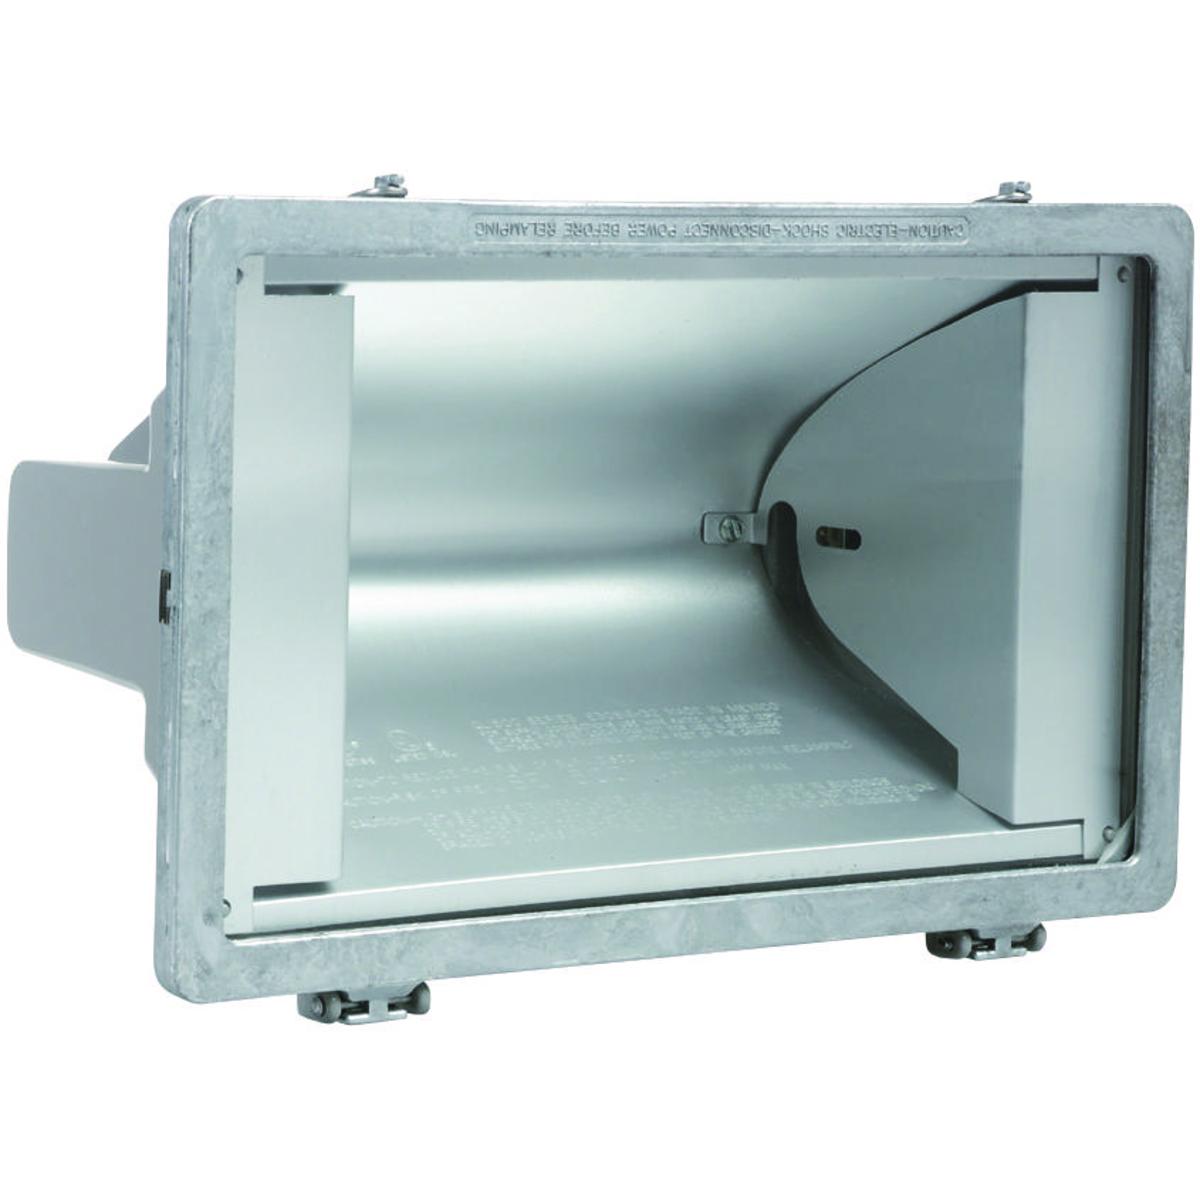 HUB QL-1505 1000/1500W FLOOD